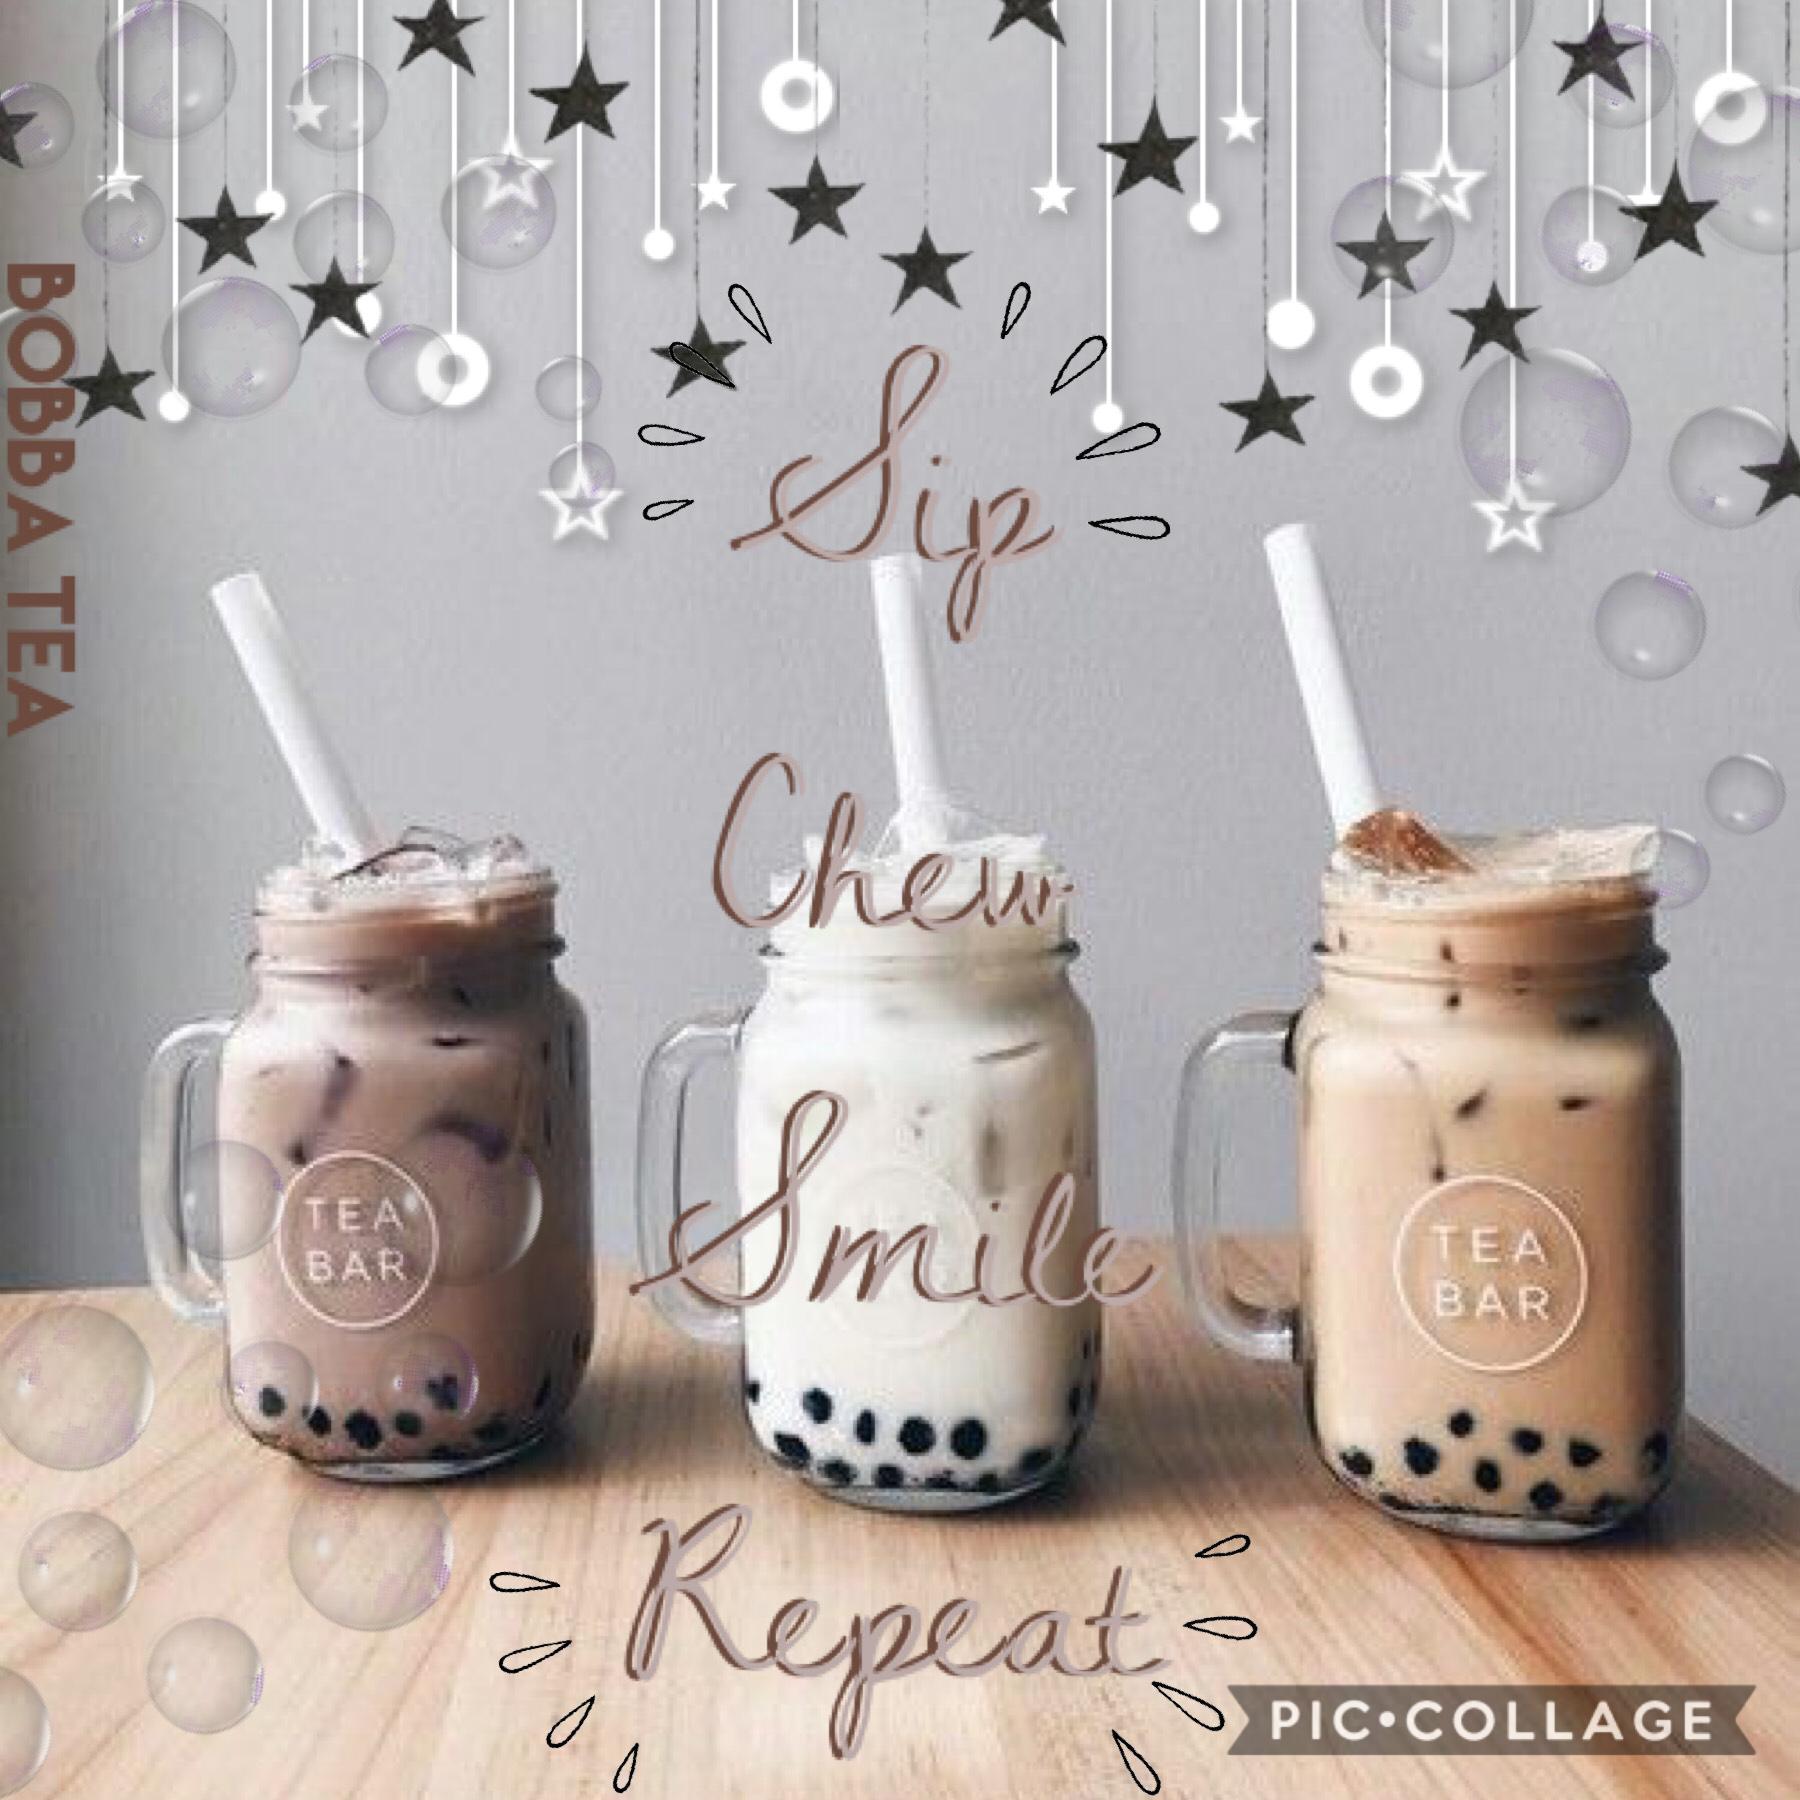 ☕️Bobba Tea☕️  Sip, chew, smile, rpt.😁